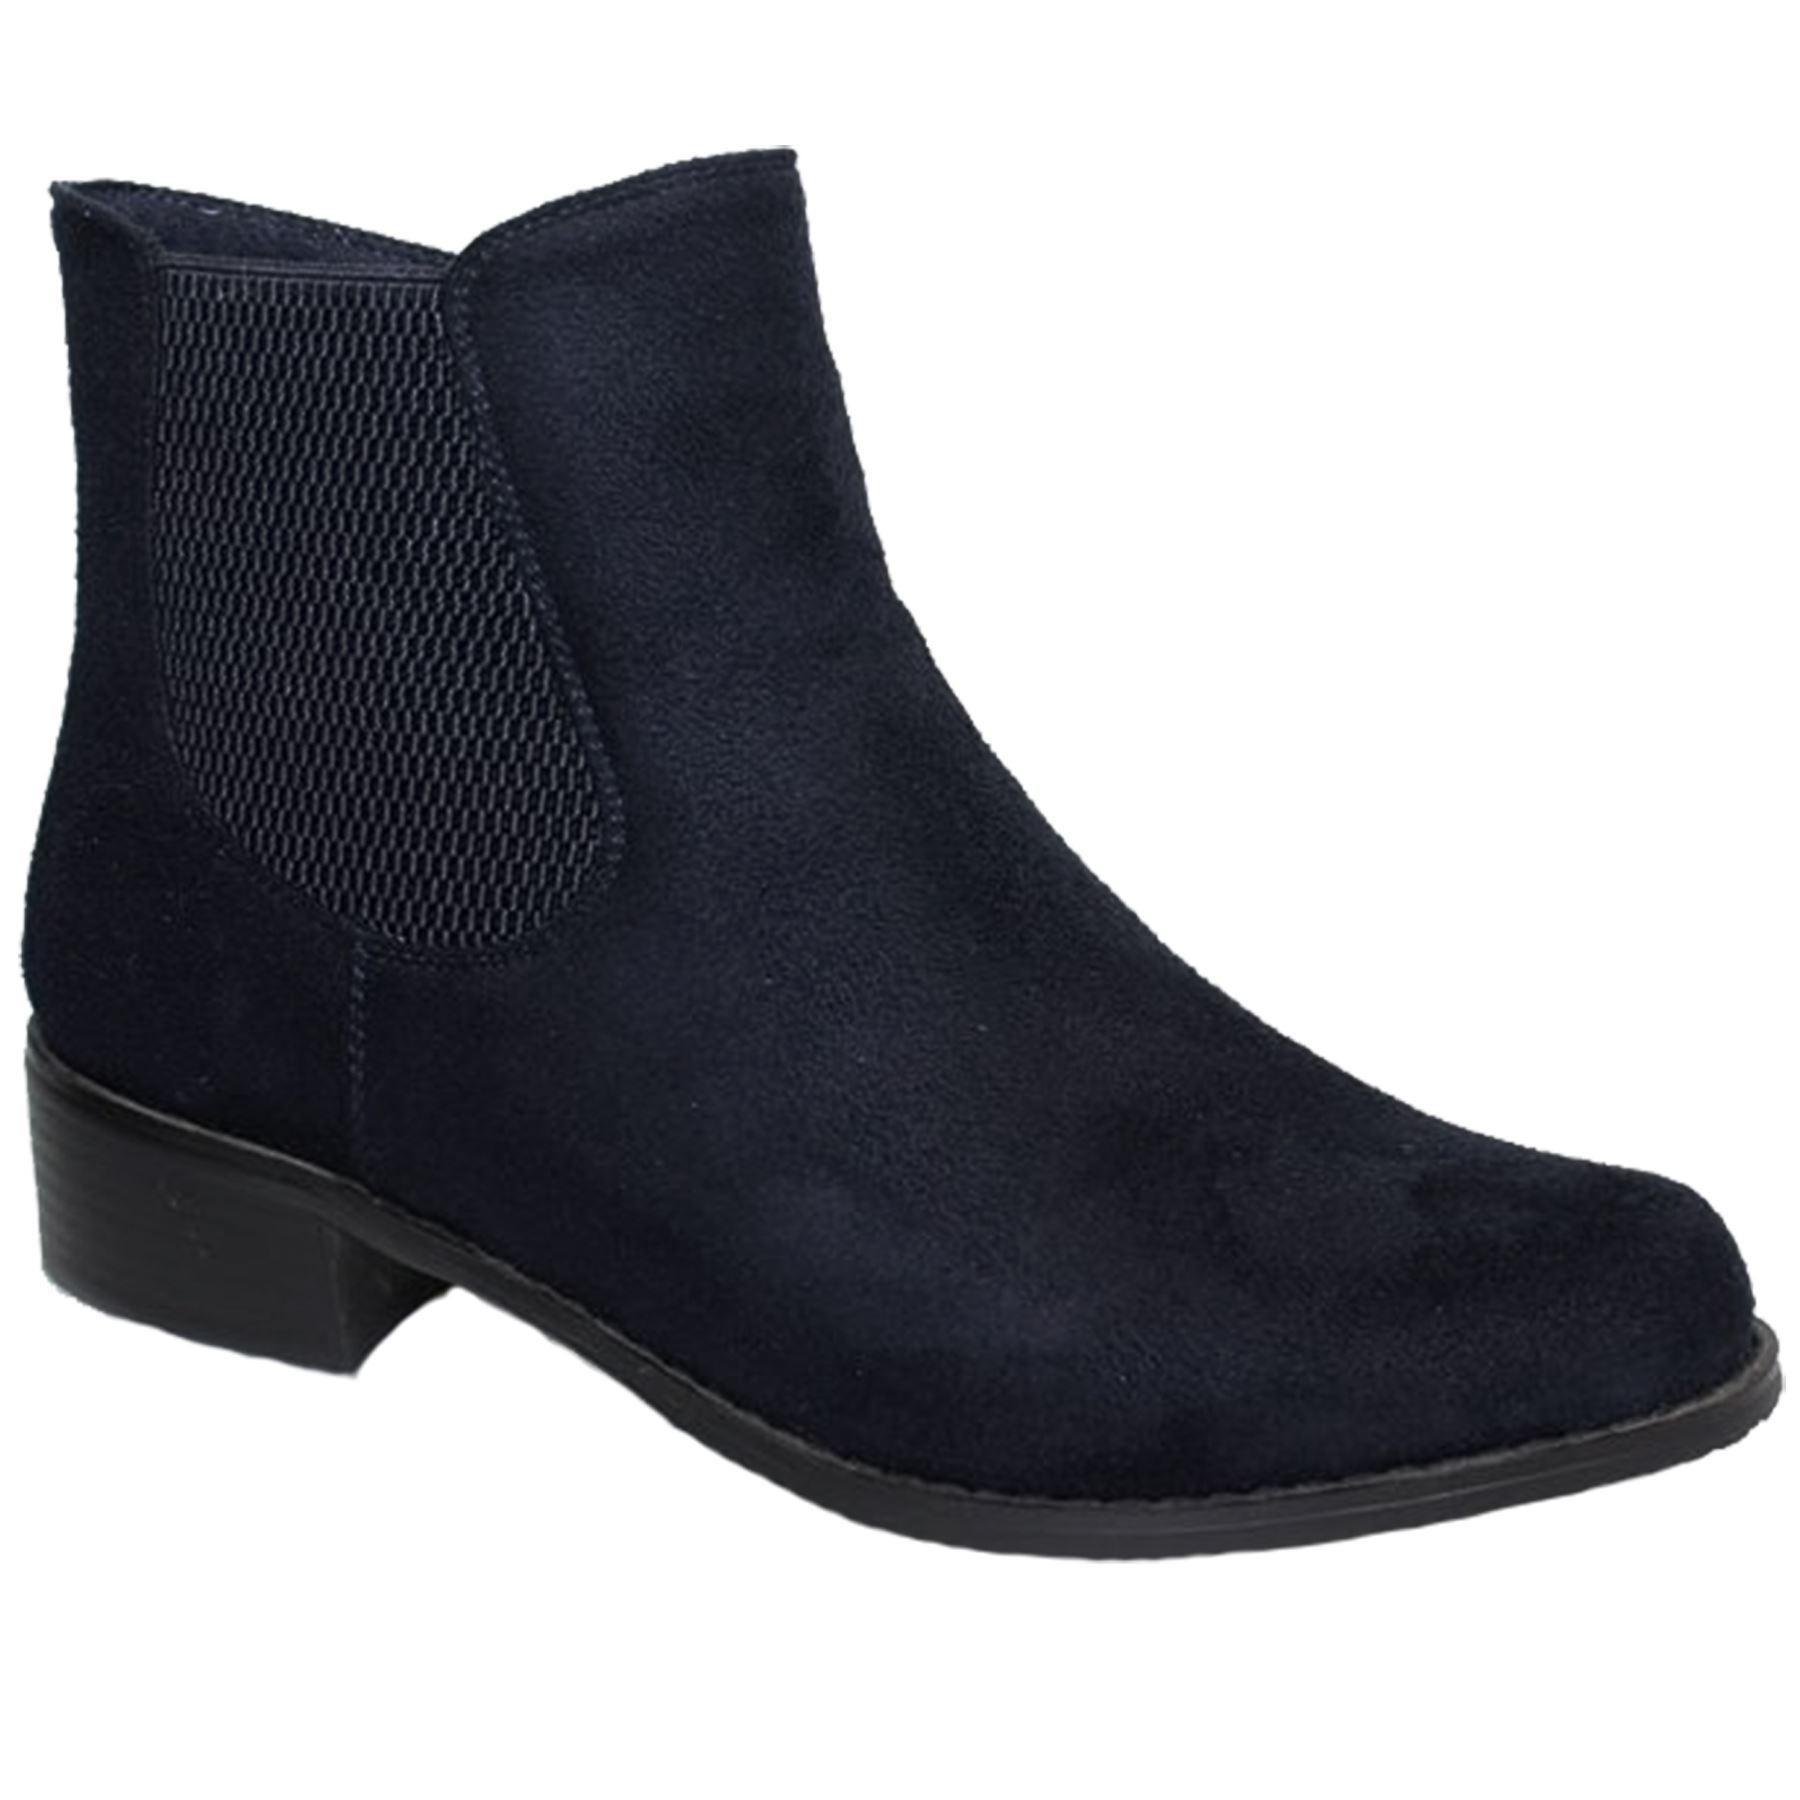 GLC541 Damenschuhe Mezzo Elasticated Heel Side Faux Suede Niedrig Heel Elasticated Ankle Stiefel 078200